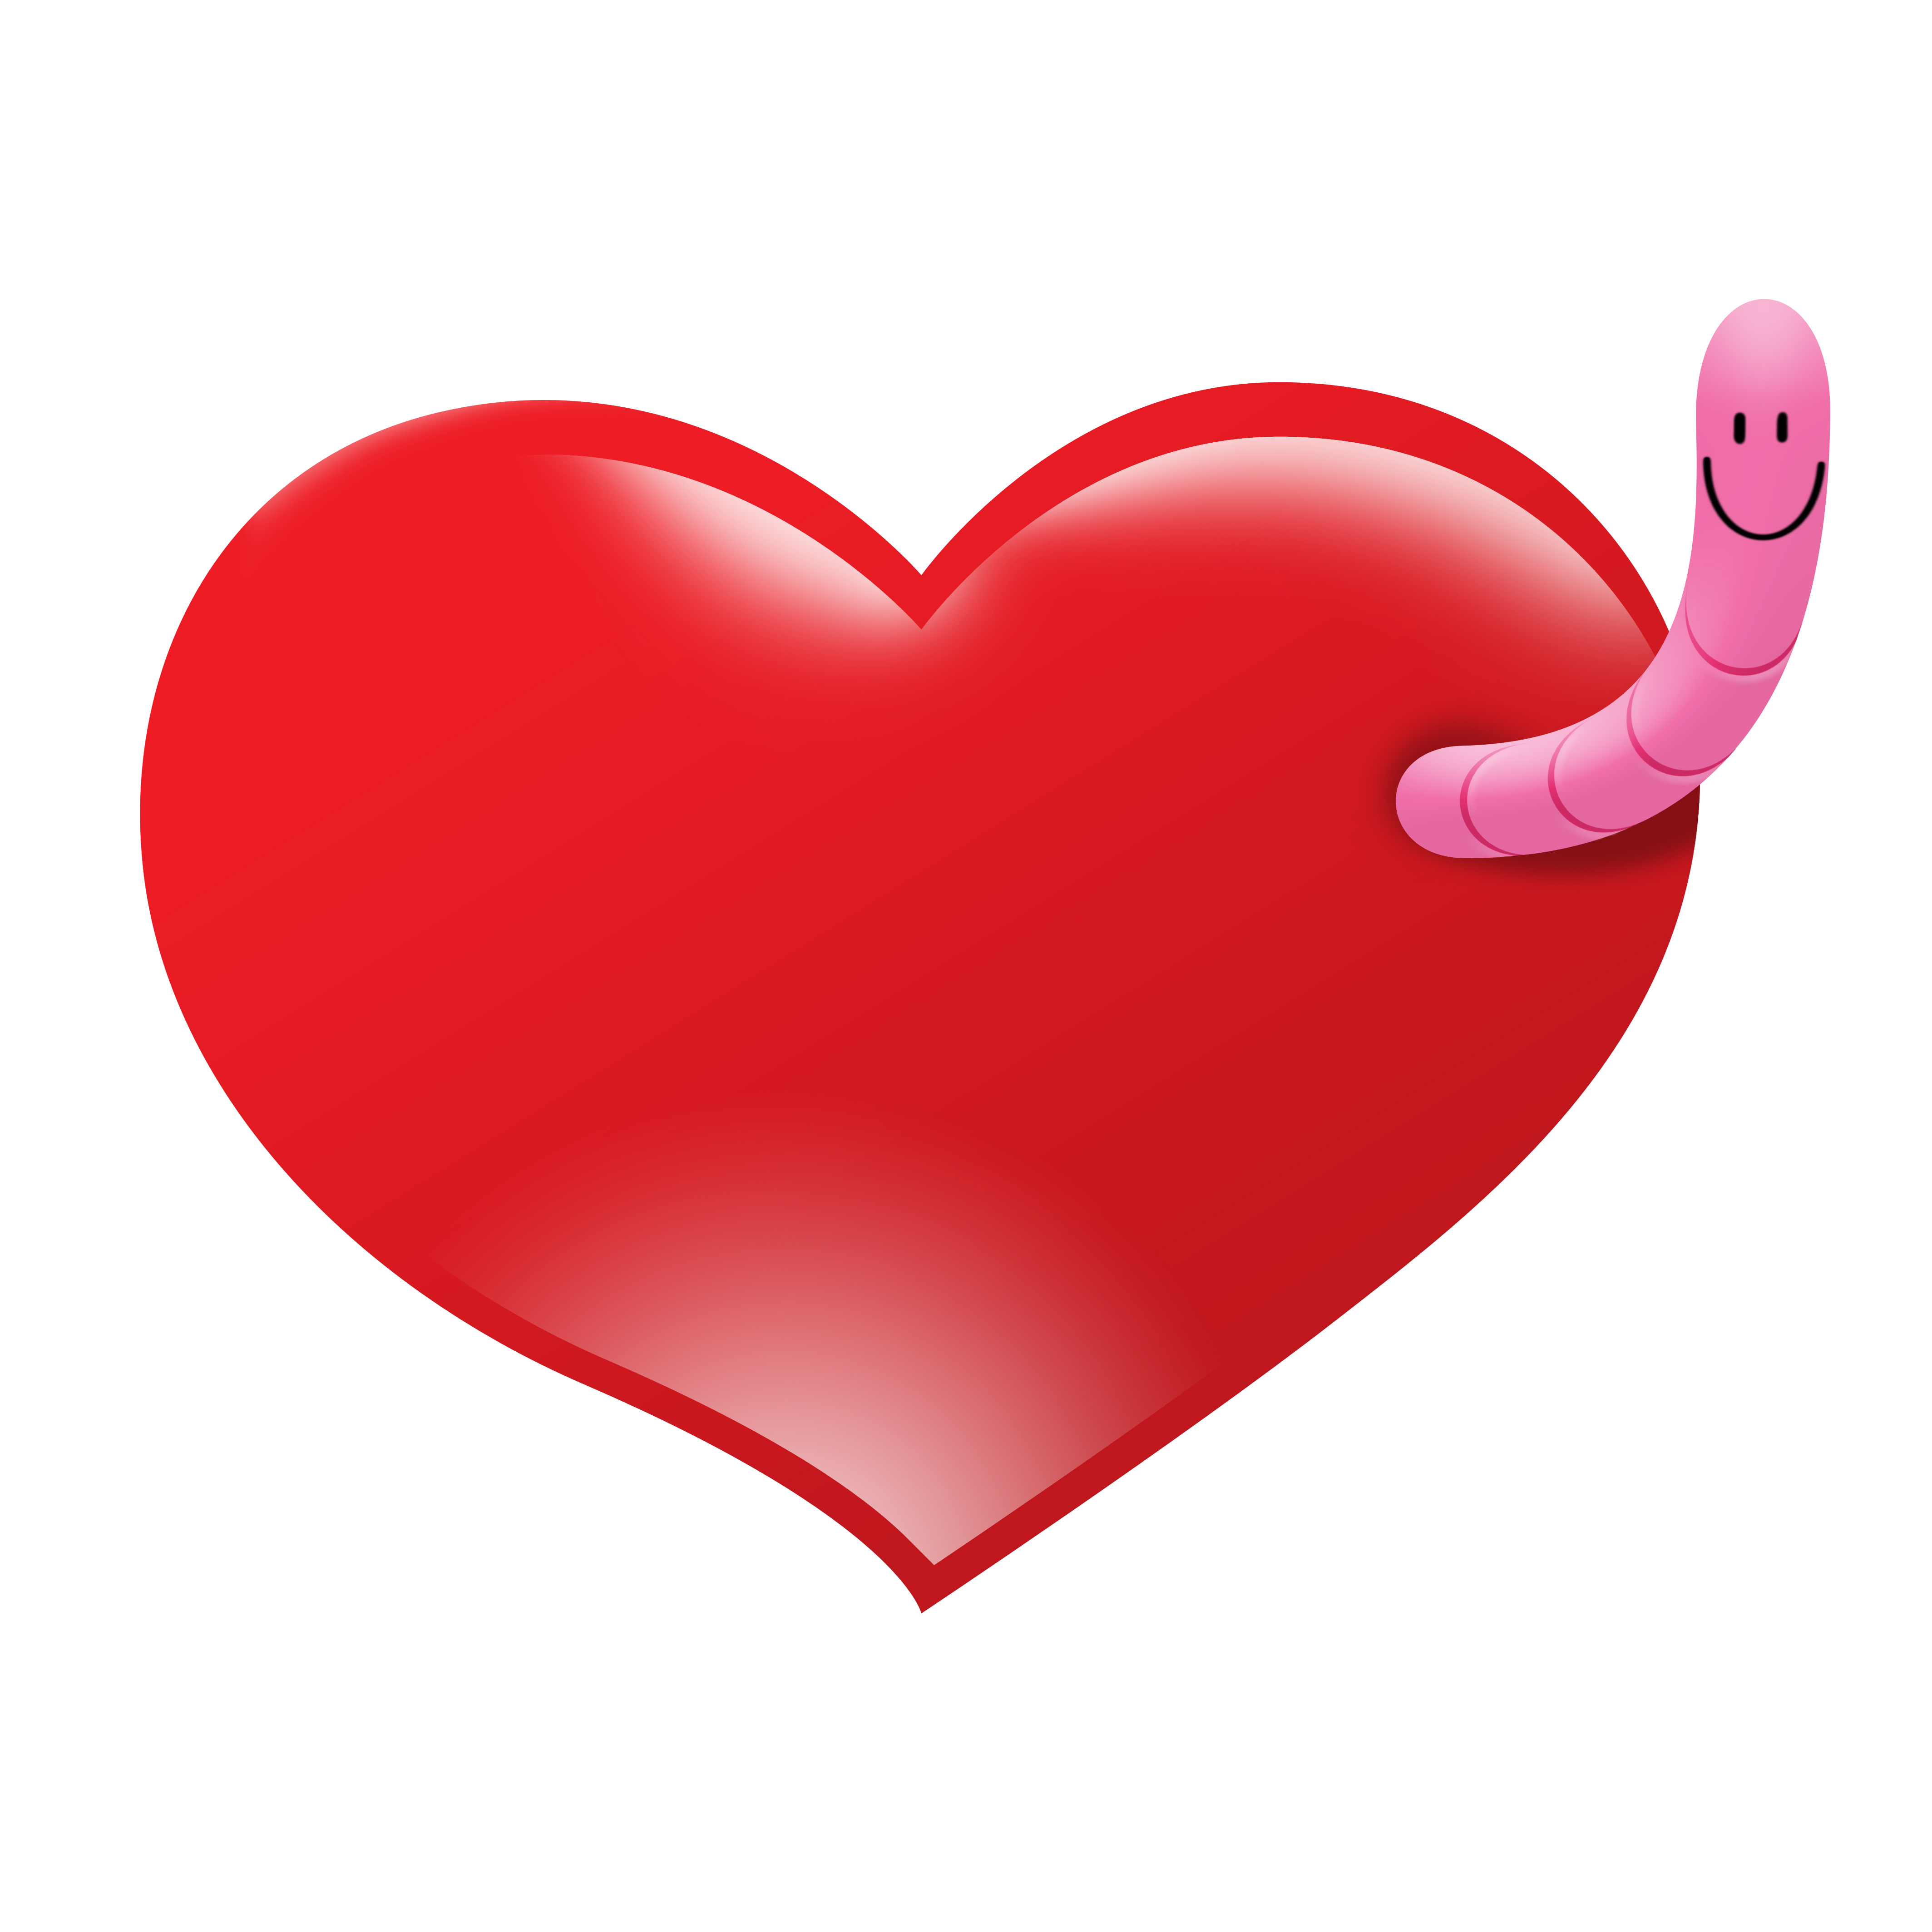 Worms clipart valentines graphic transparent download Free Saint Valentine Image, Download Free Clip Art, Free ... graphic transparent download